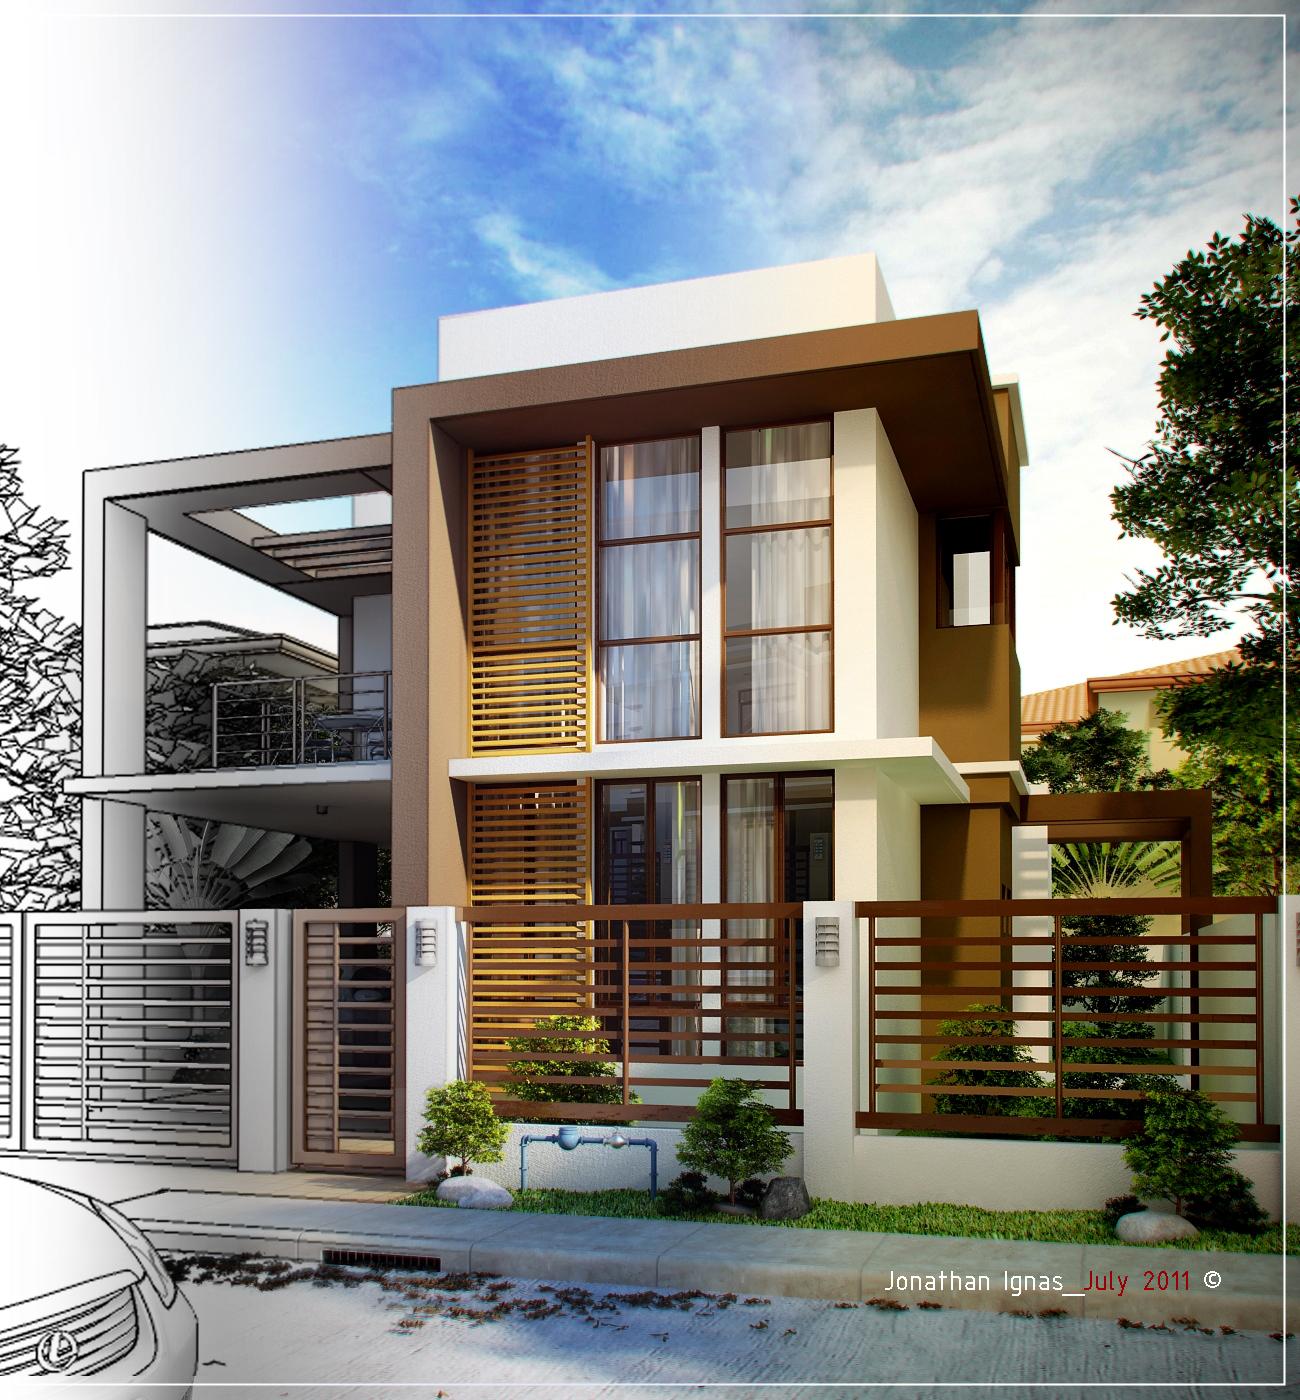 Designanthology exterior rendering 2 for Exterior rendering